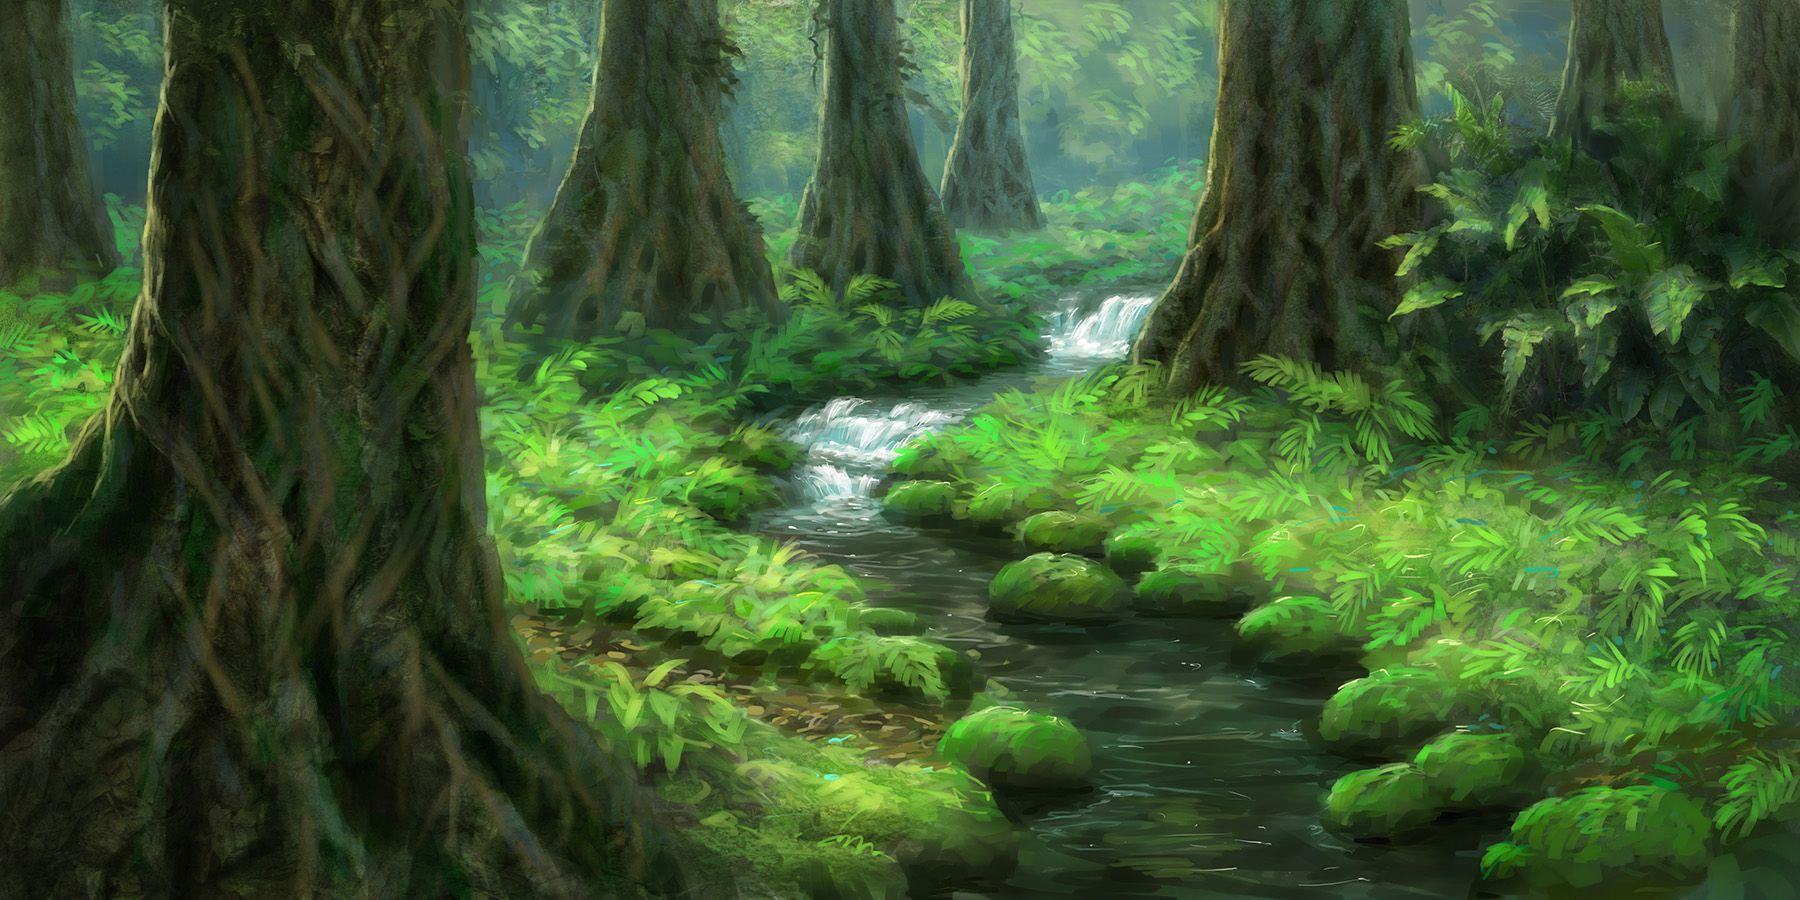 Jungle Wallpaper World Of Warcraft: Concept Art, Illustrations And Art Google